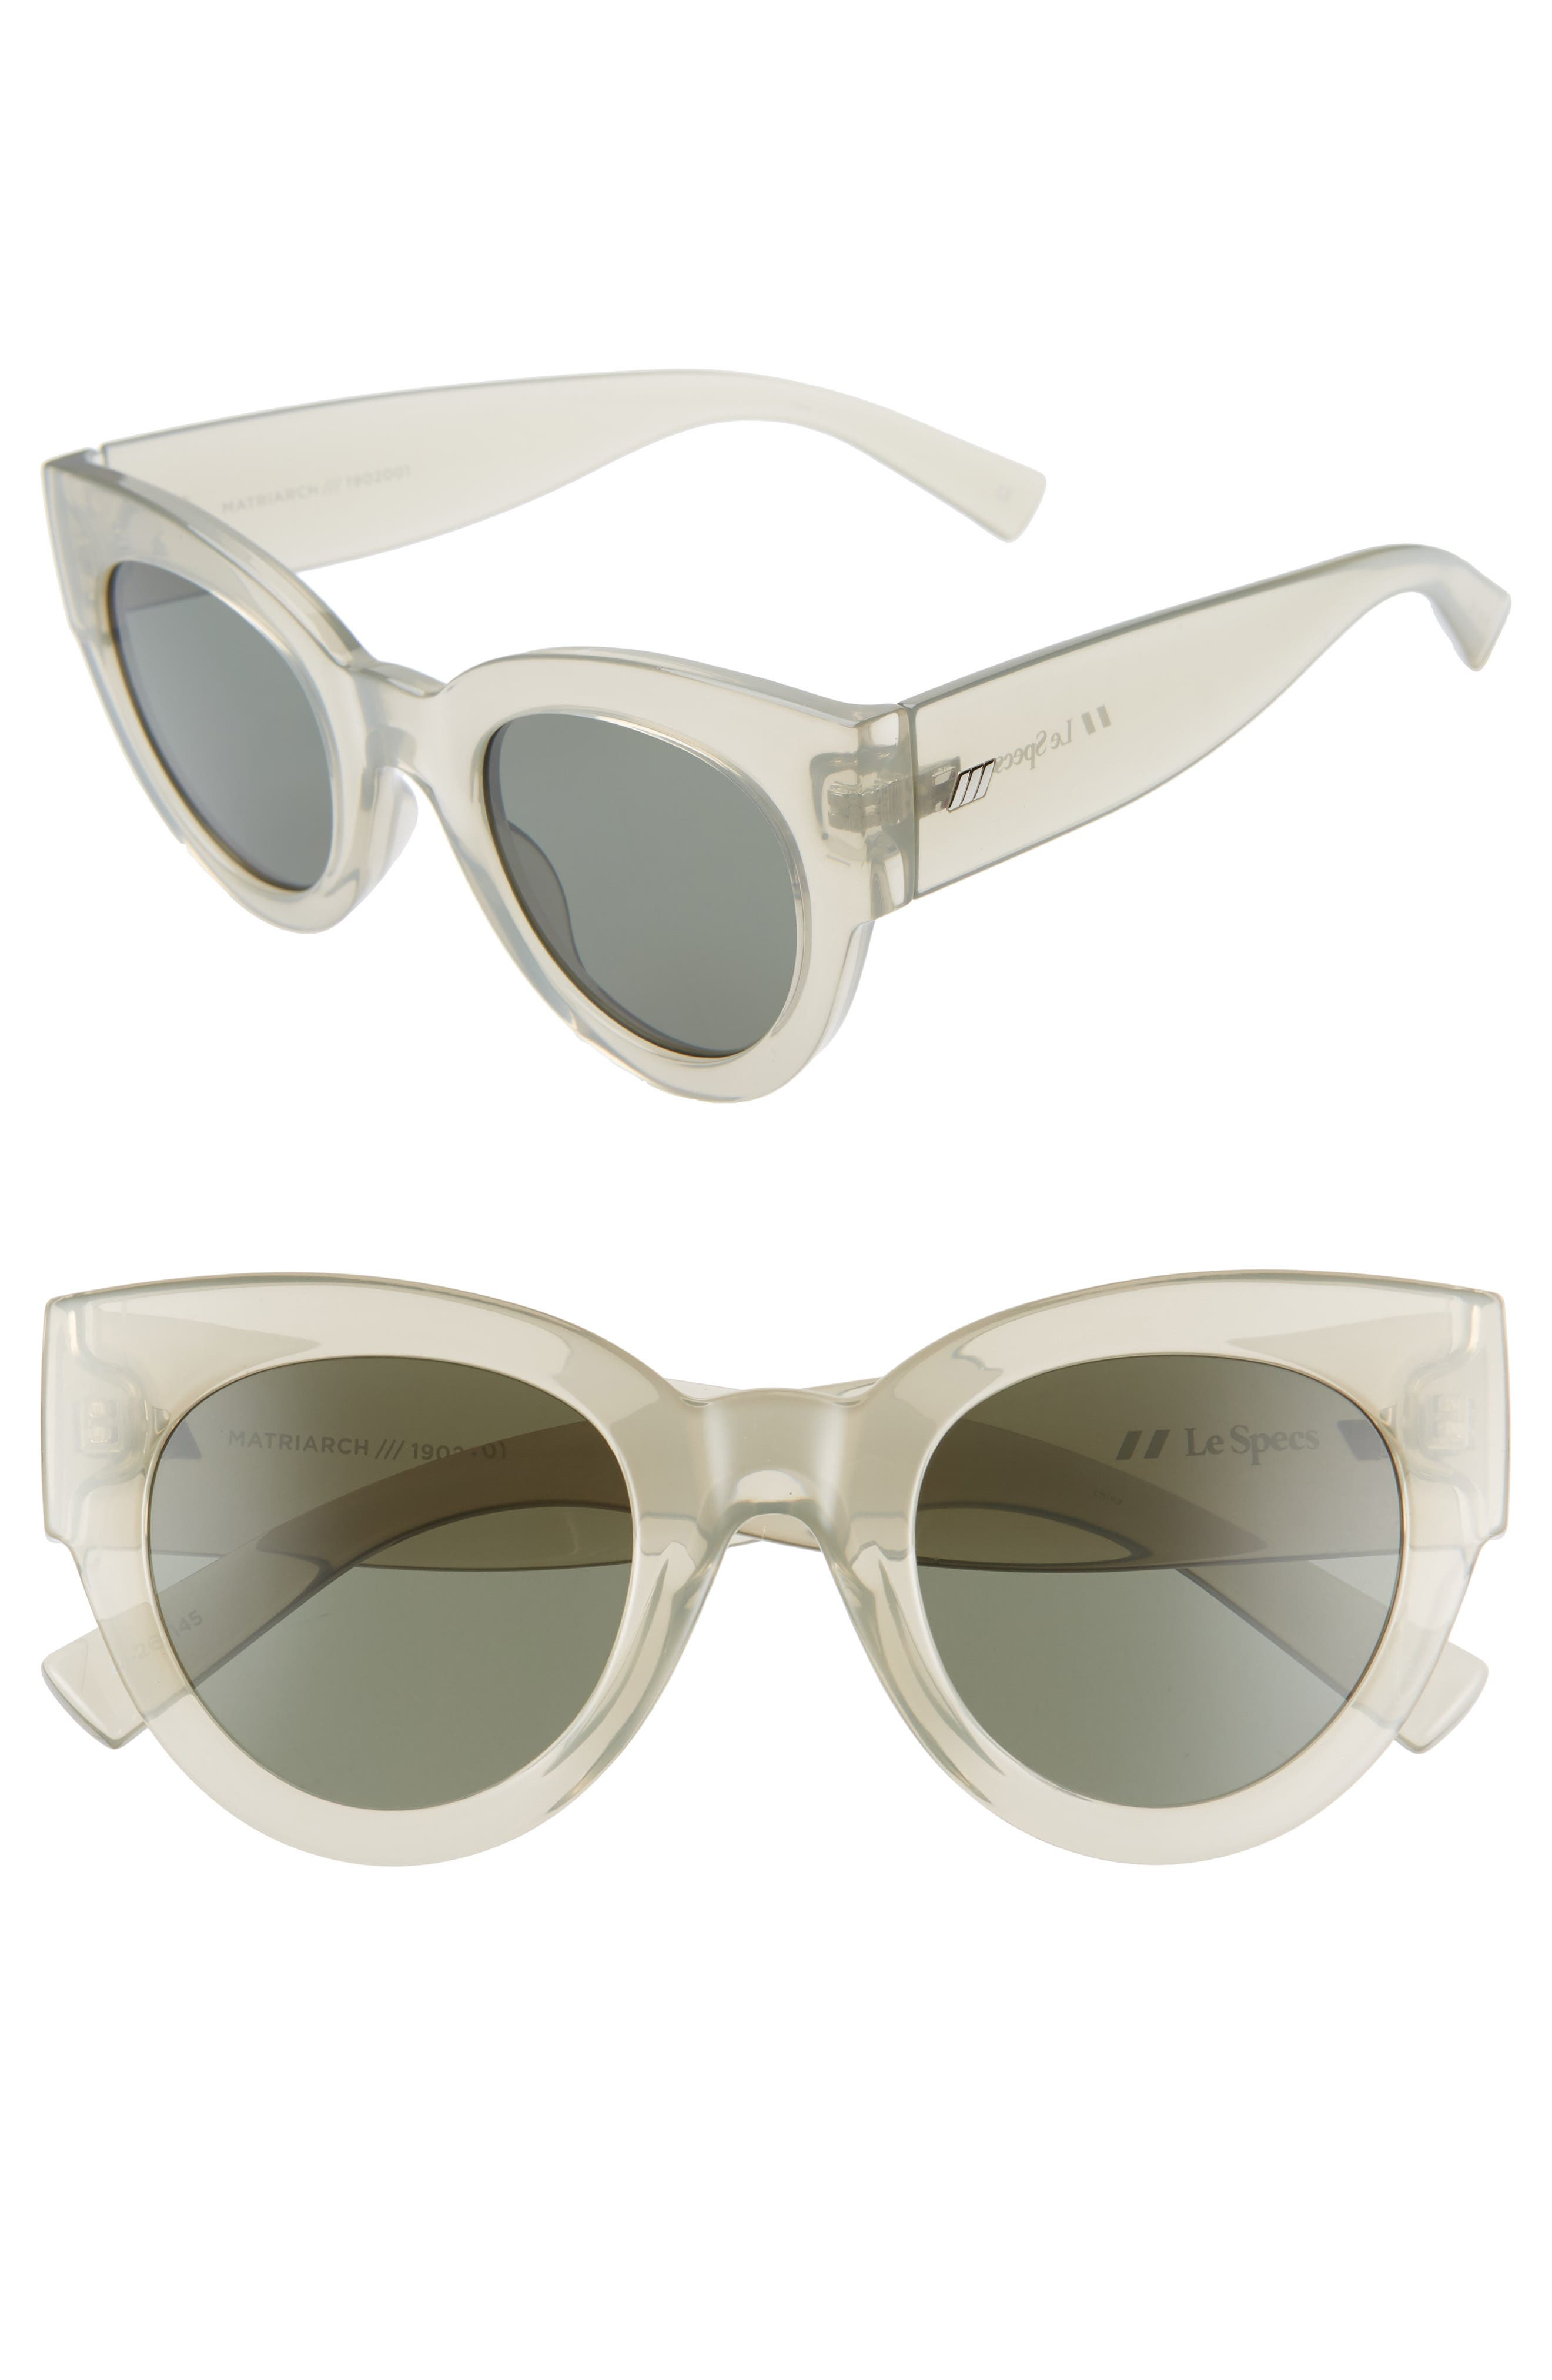 Le Specs Matriarch 4m Cat Eye Sunglasses - Transparent Matcha/ Khaki